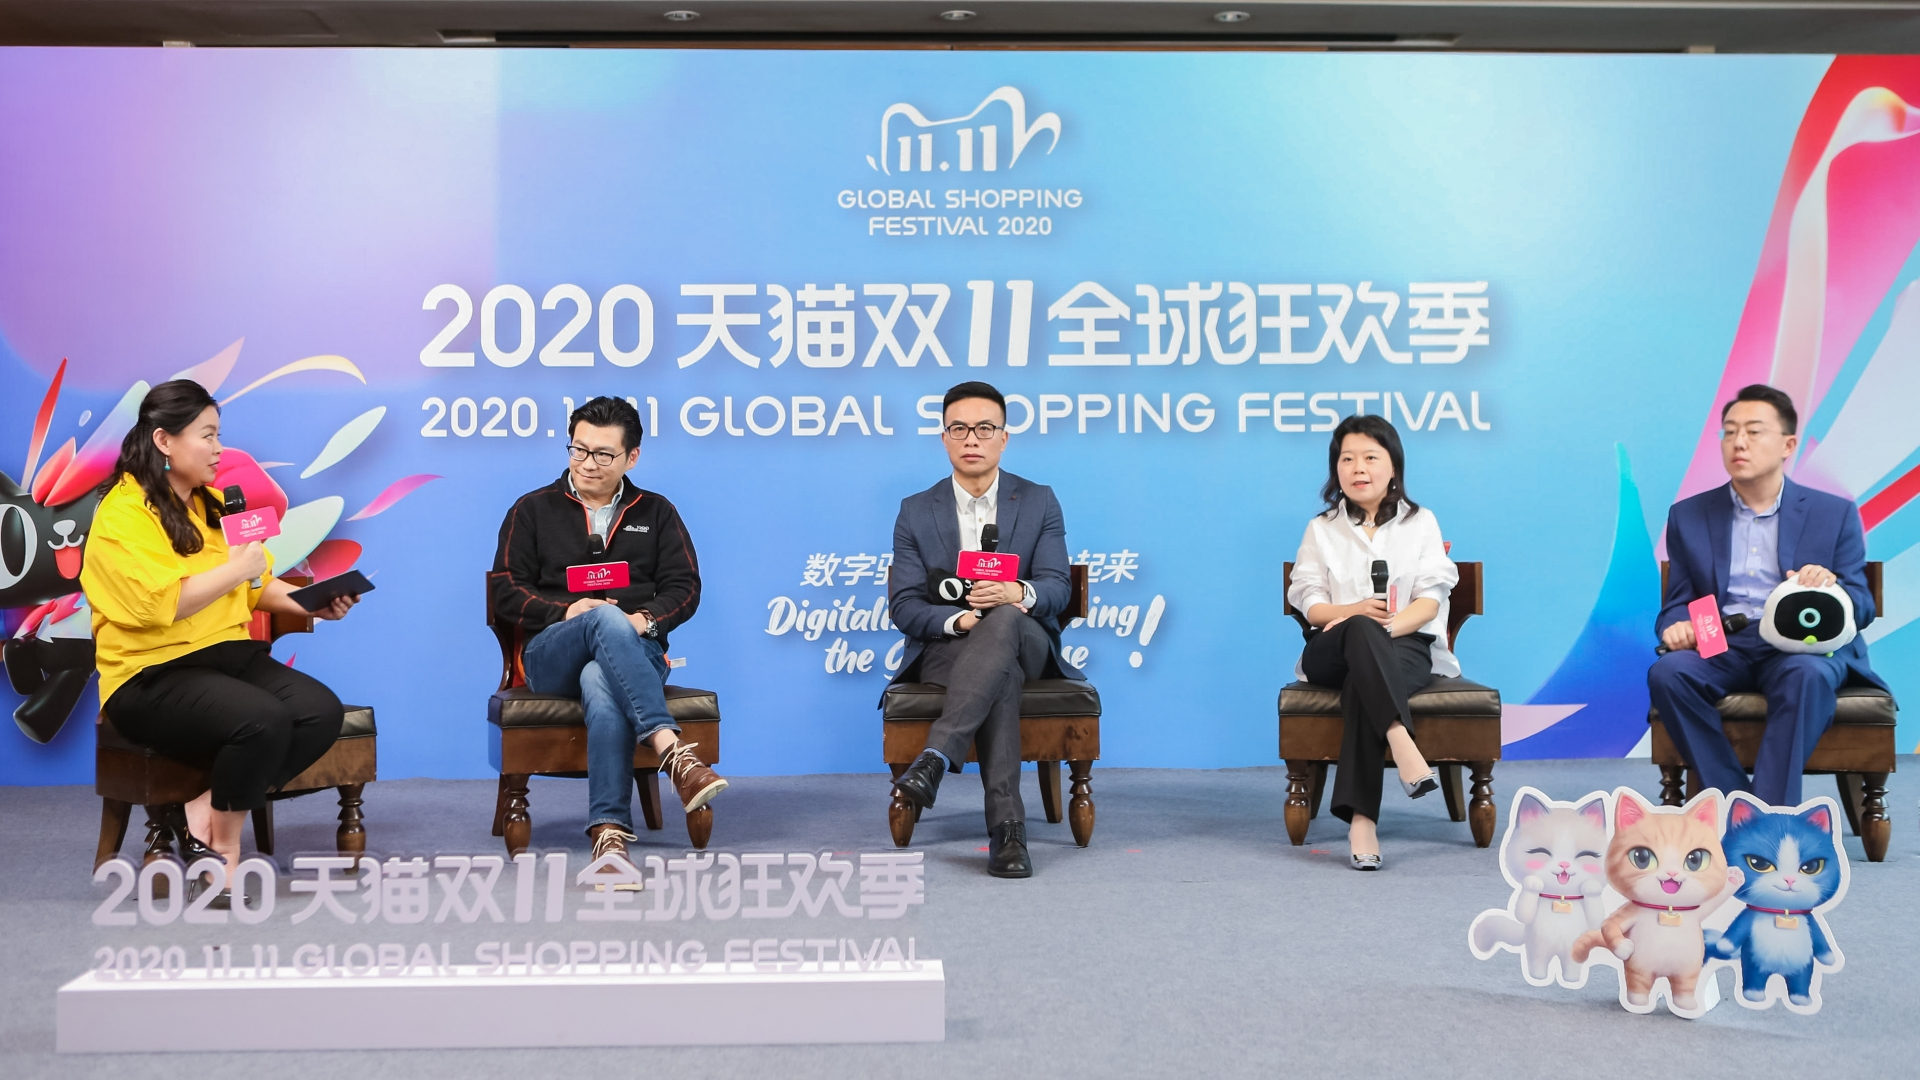 alibaba 1111 global shopping festival is on horizon